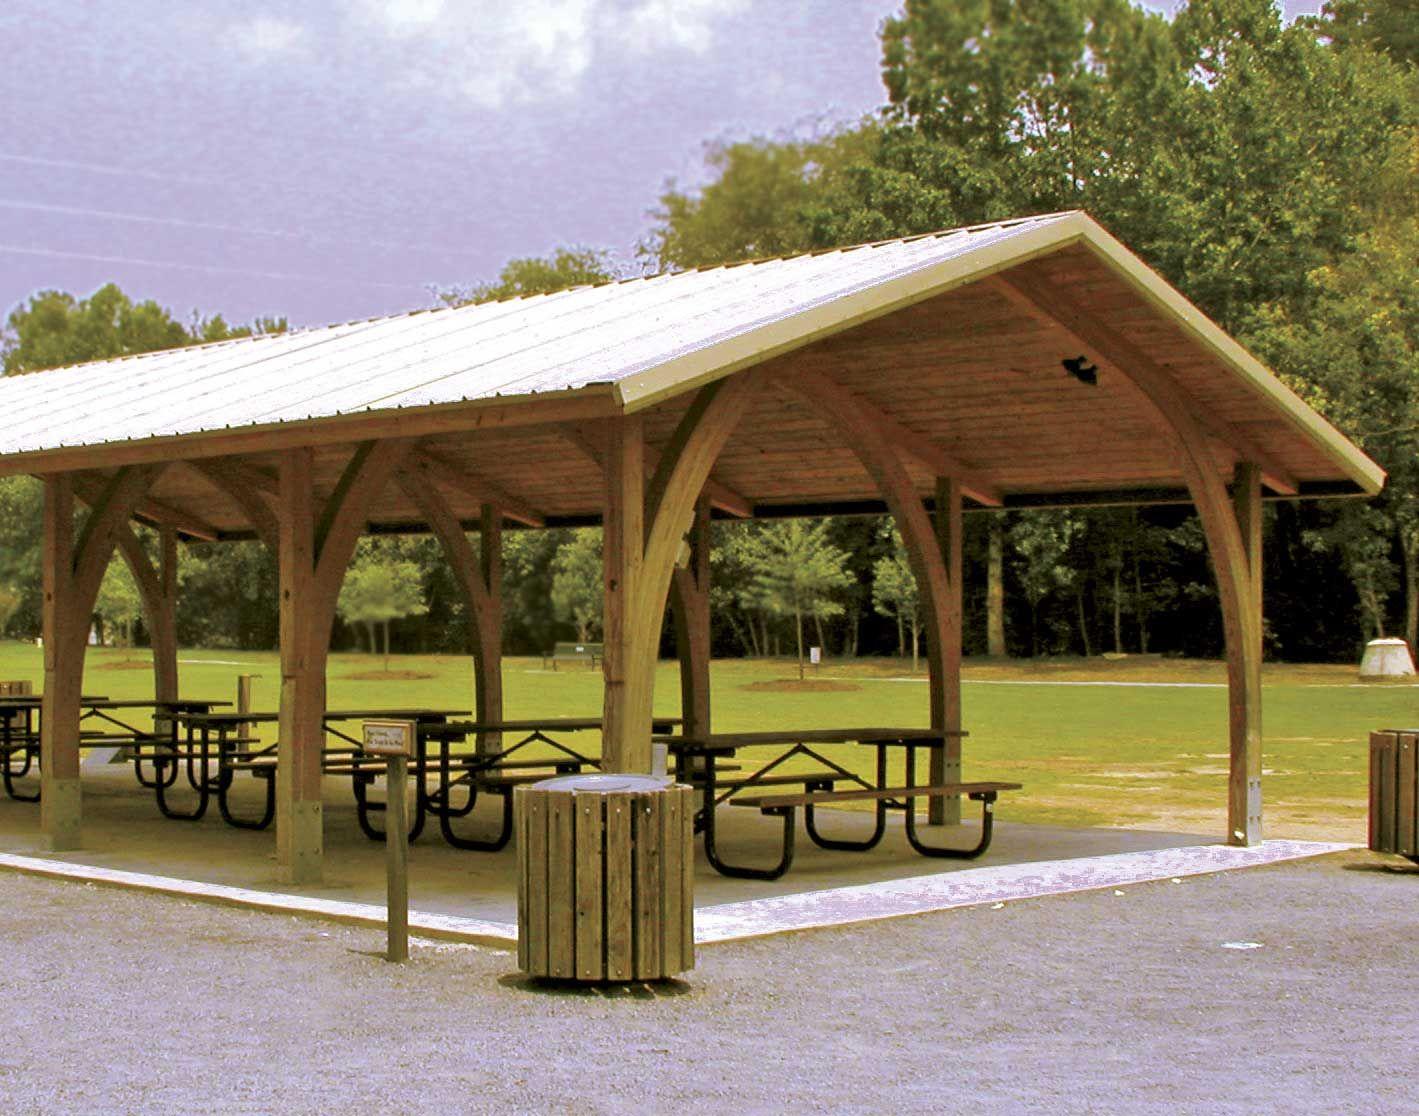 Pavilions Outdoor Learning Backyard Pavilion Outdoor Decor Backyard Outdoor Pavilion